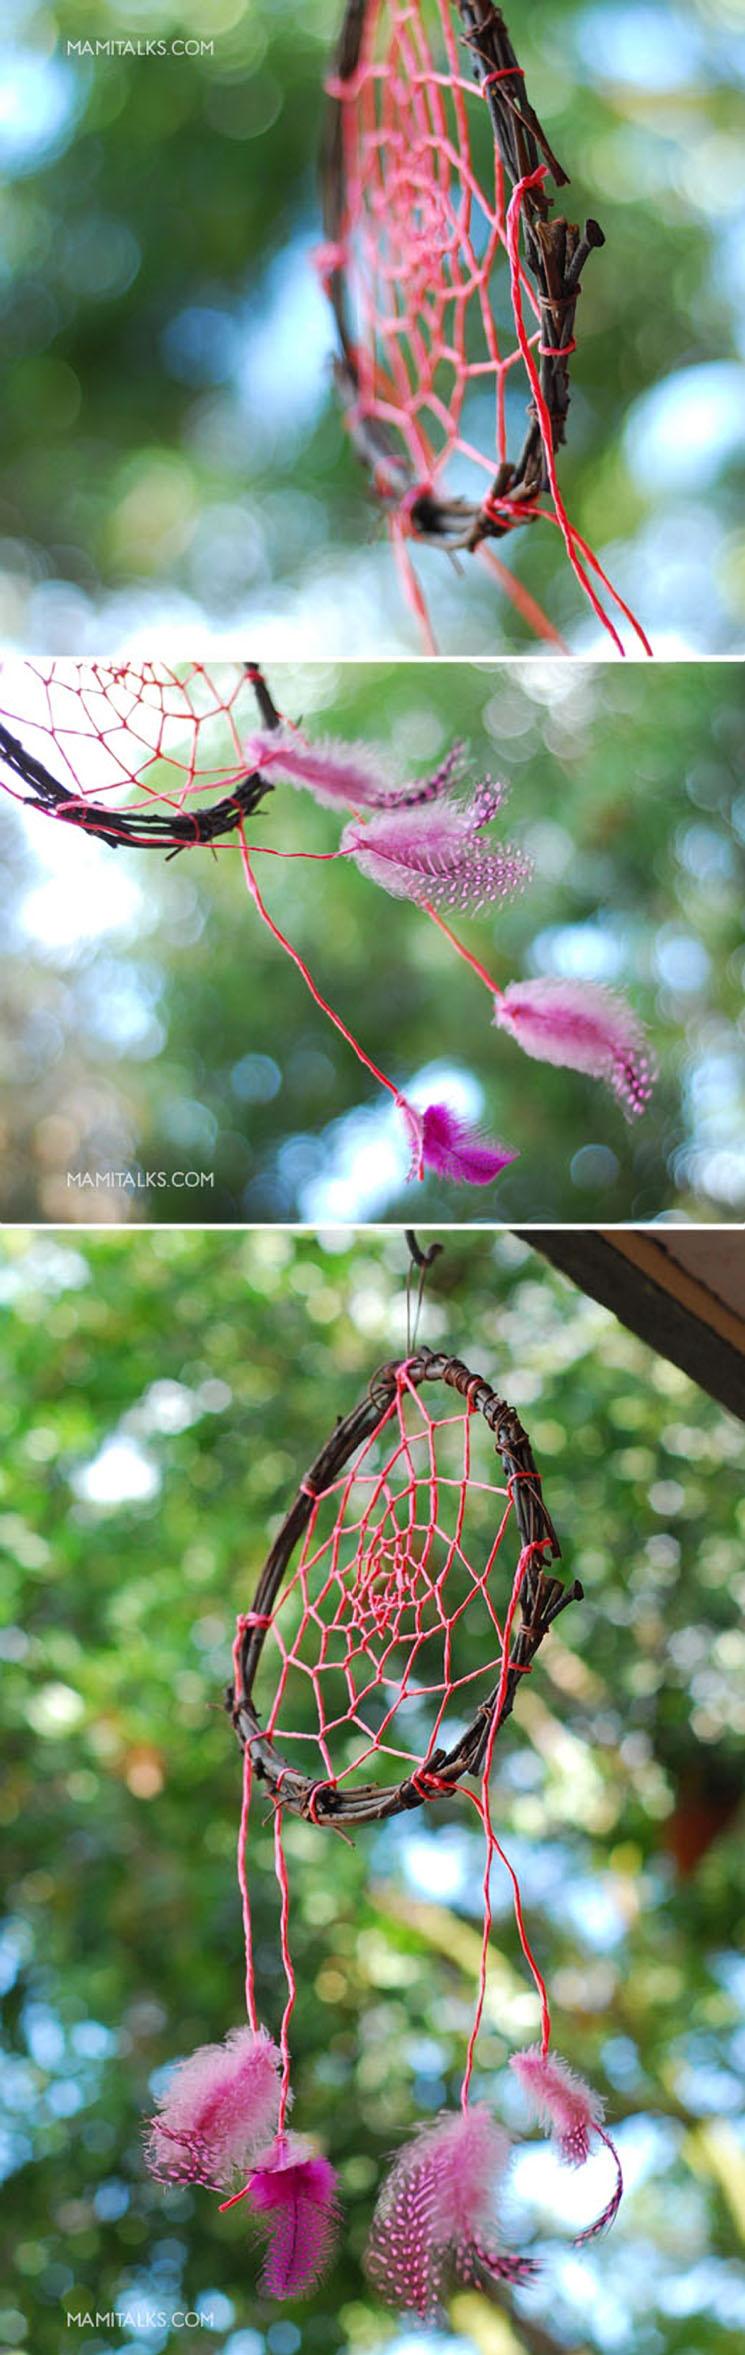 Photos of dreamcatcher with pink. MamiTalks.com